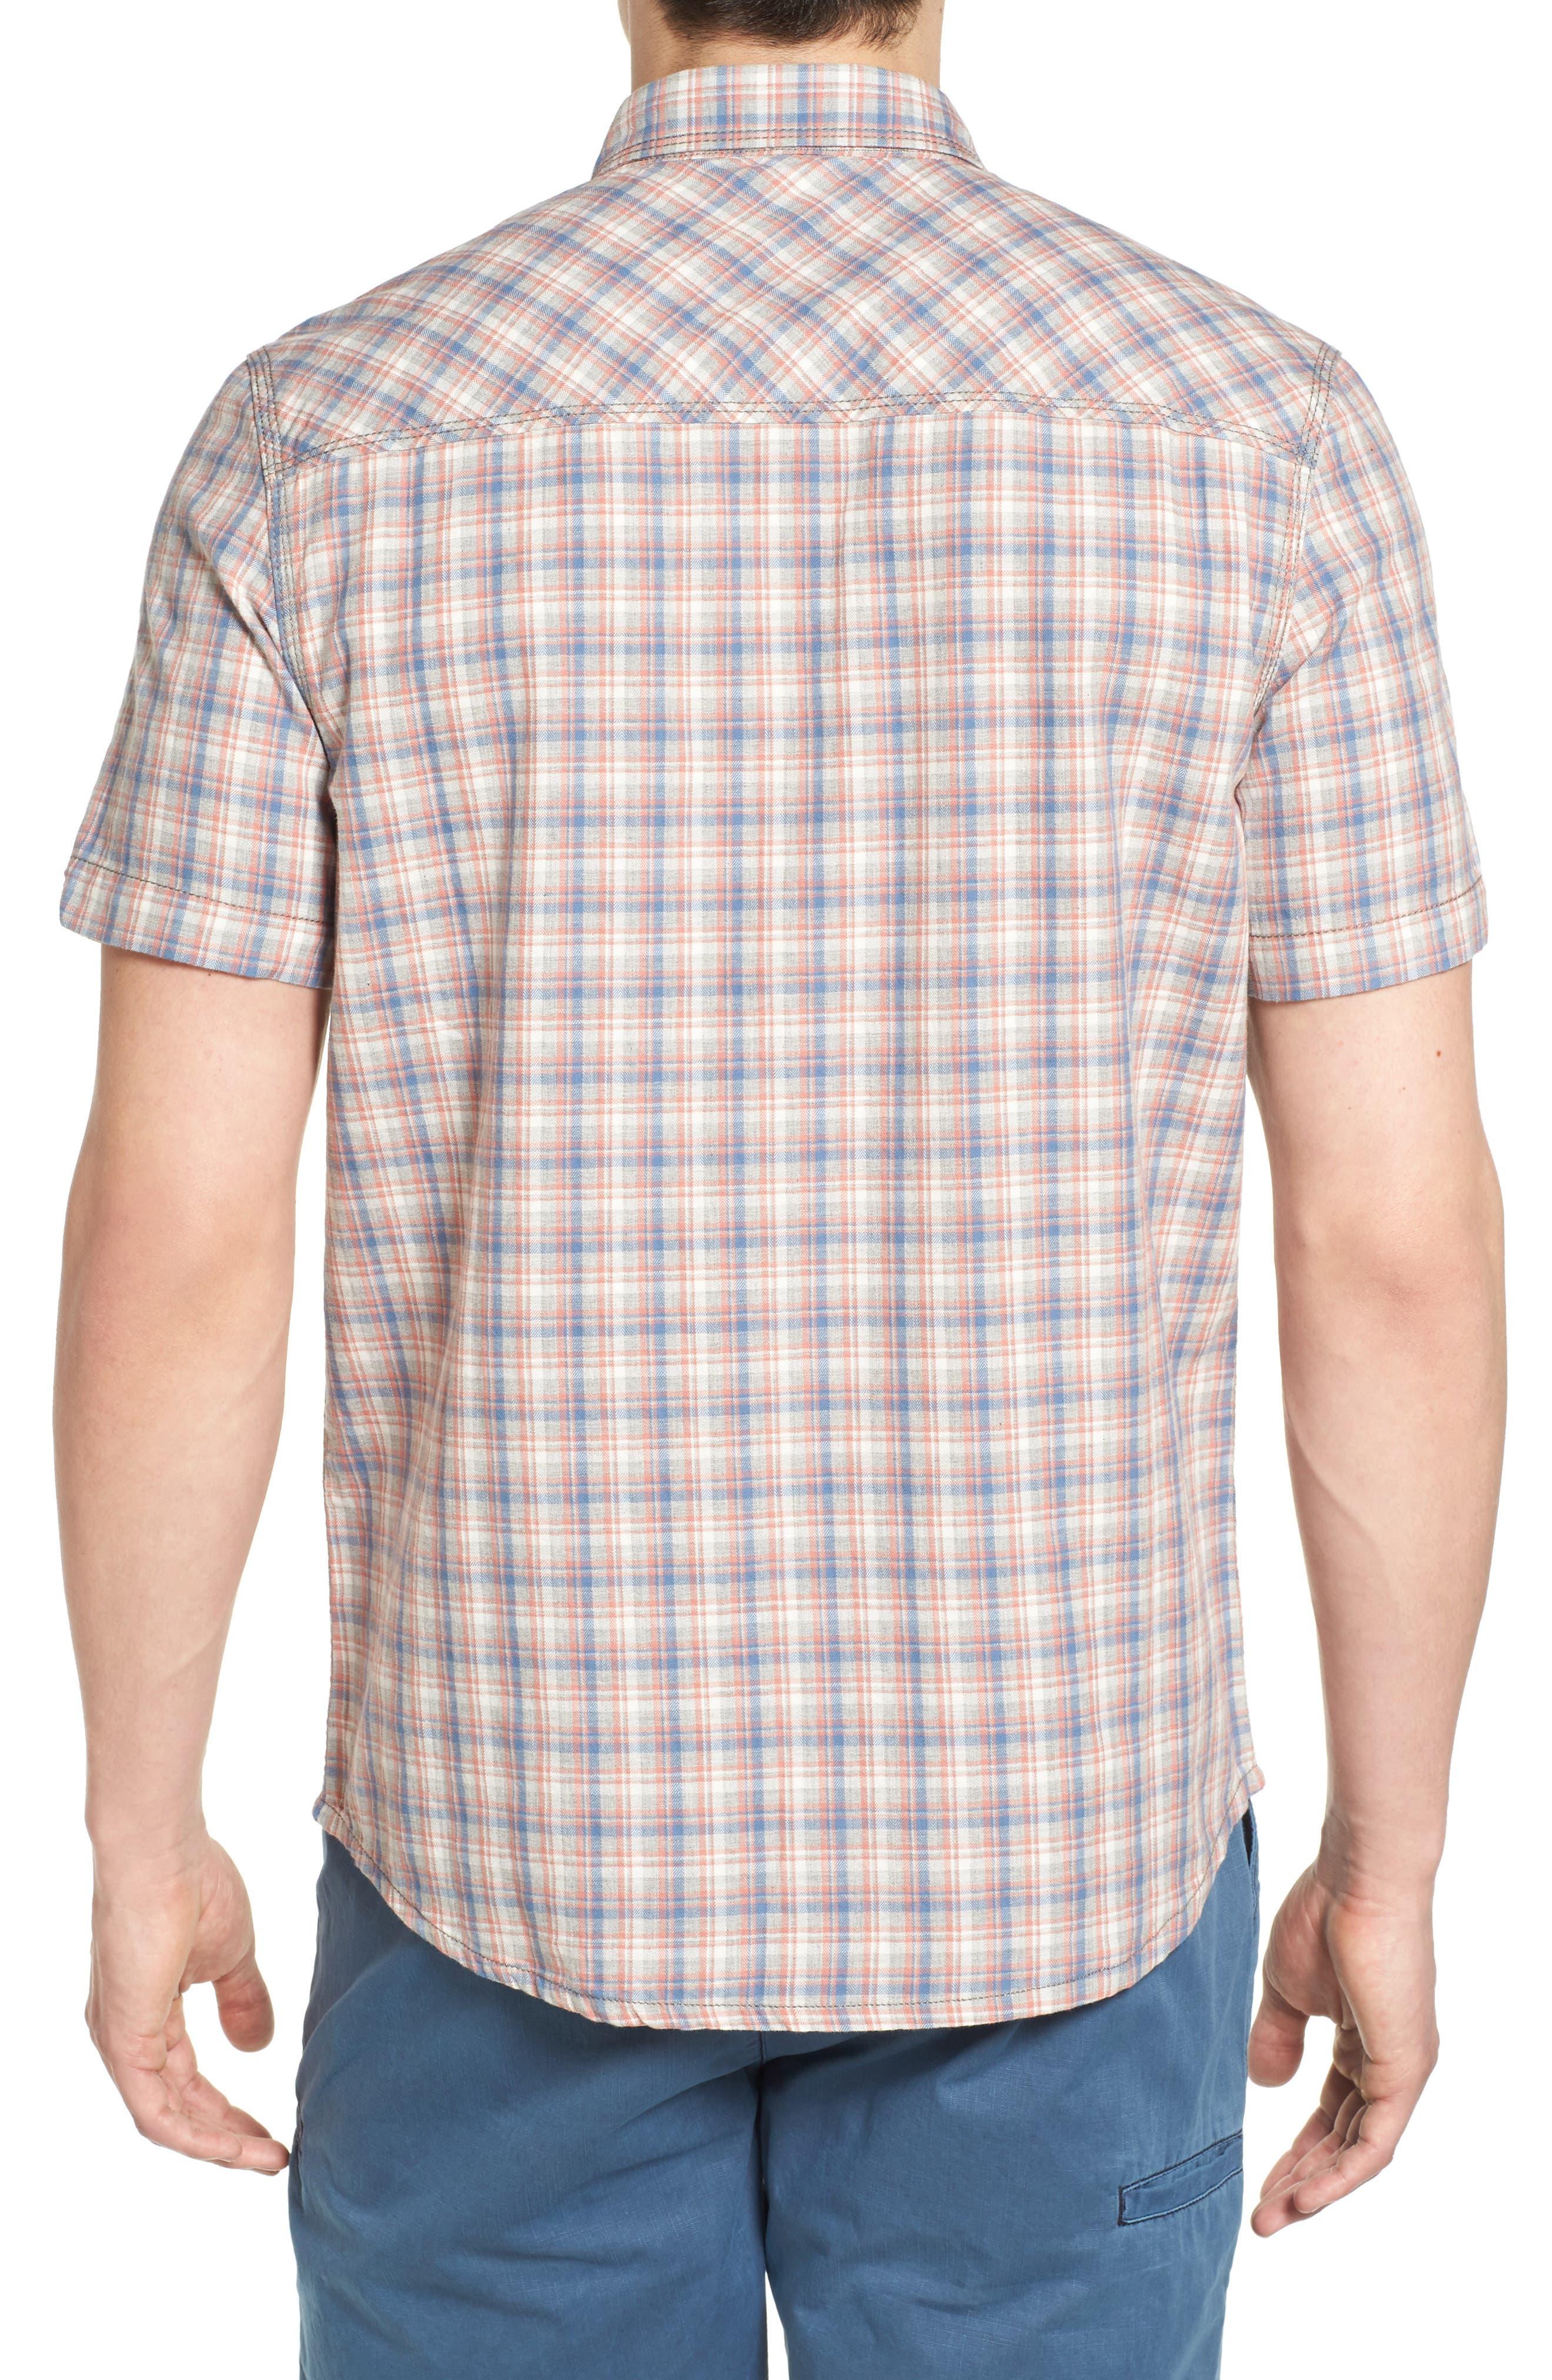 Solana Regular Fit Herringbone Plaid Sport Shirt,                             Alternate thumbnail 2, color,                             Elephant Heather